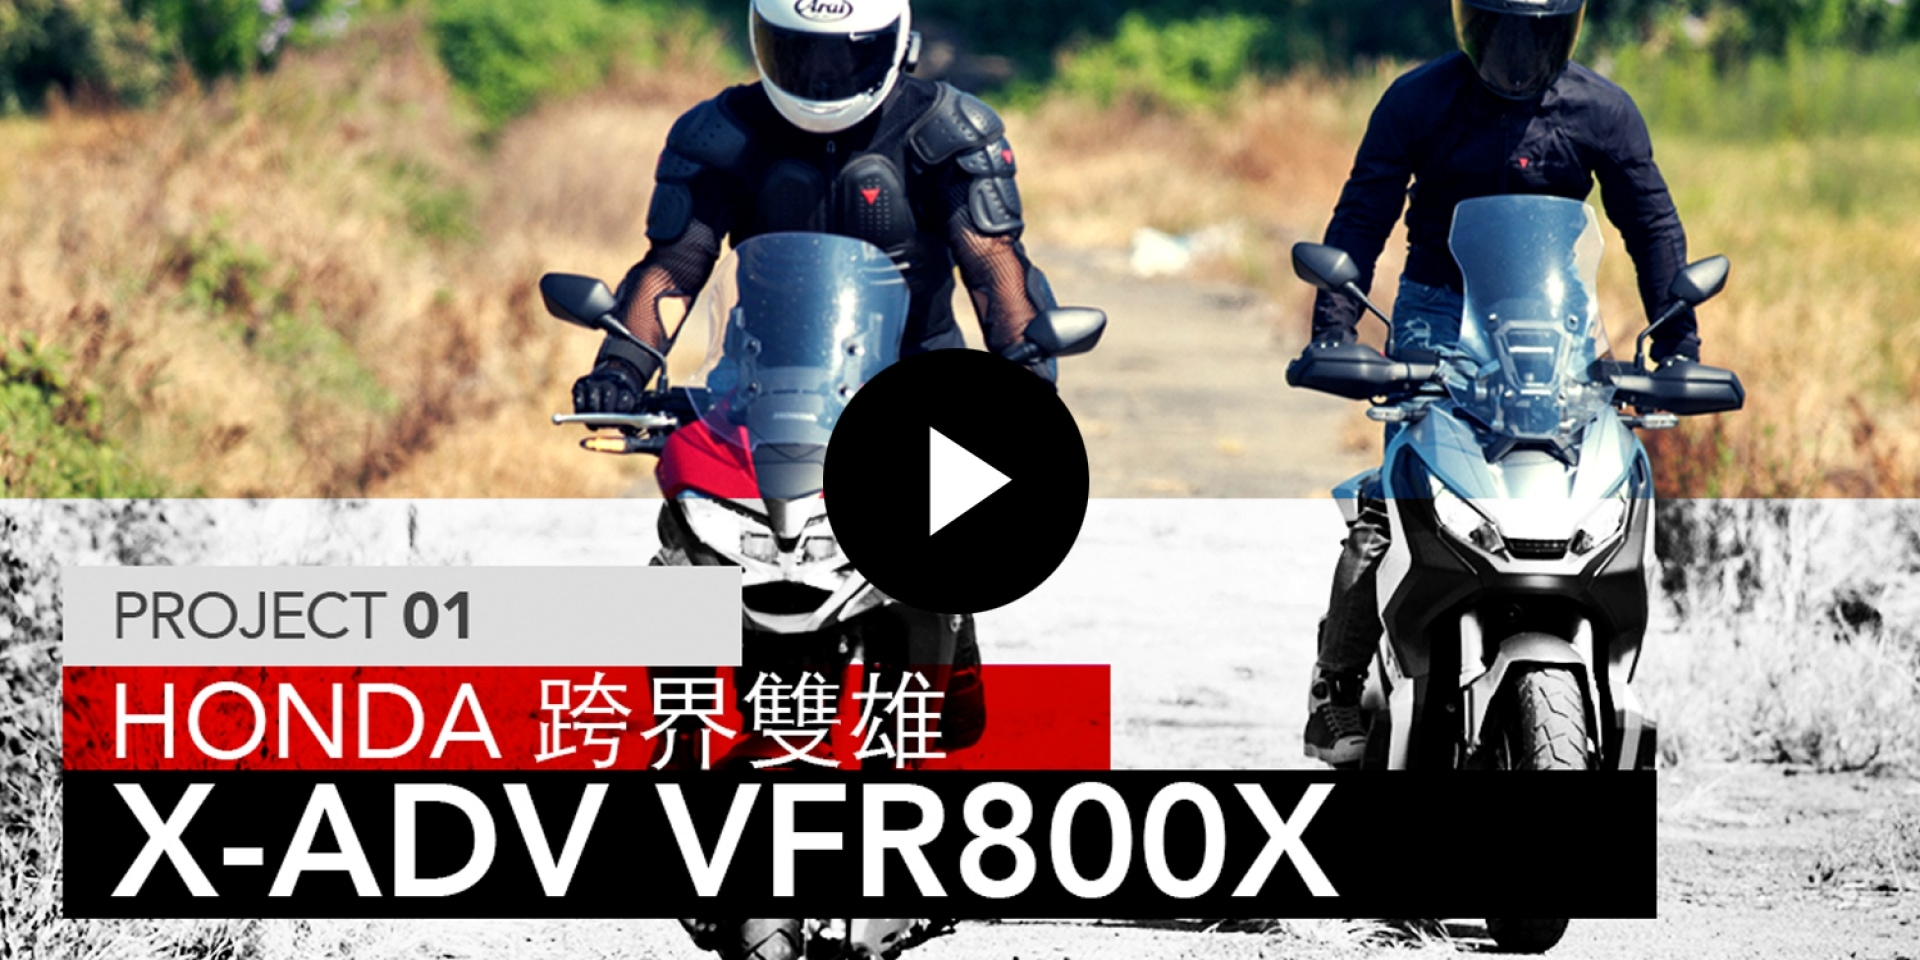 HONDA跨界雙雄,X-ADV、VFR800X / PROJECT 01